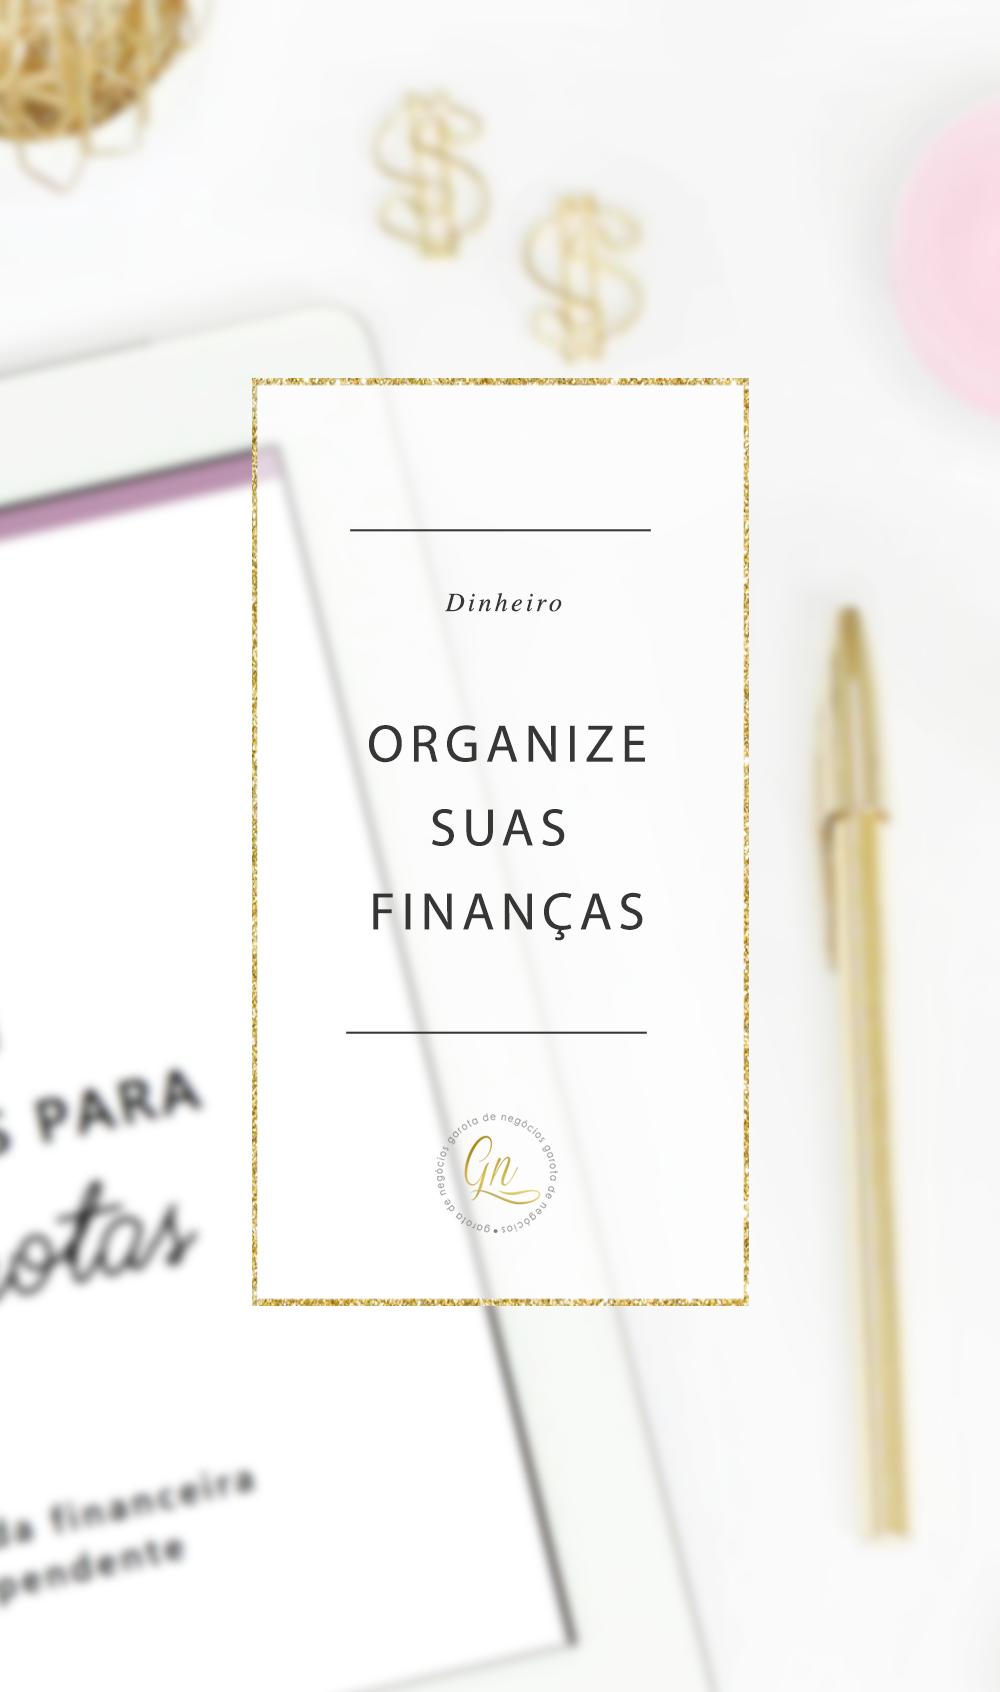 organize-suas-financas-garotadenegocios1